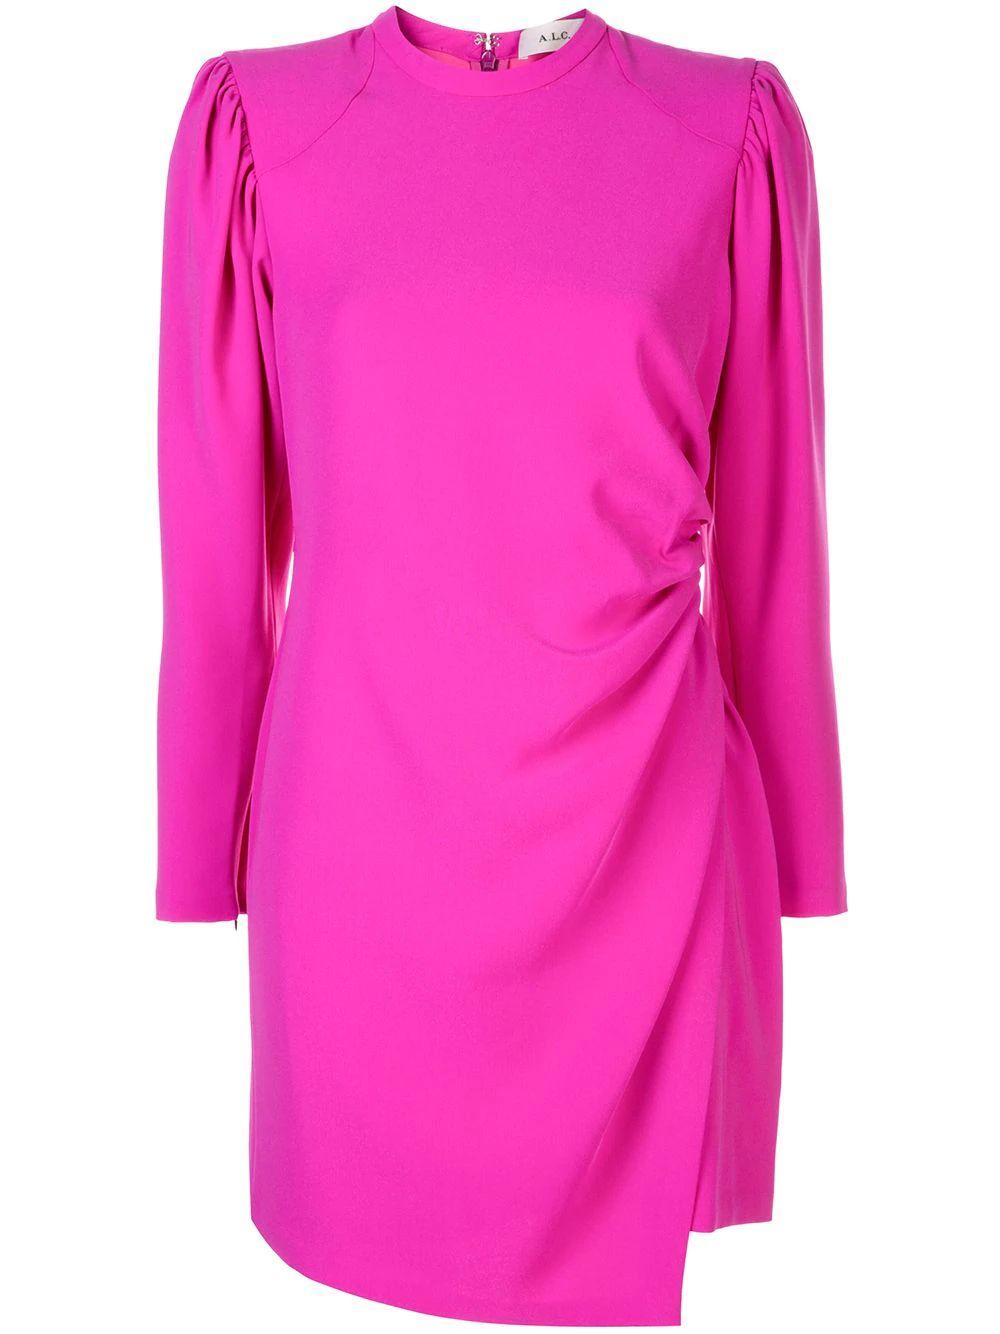 Jane Long Sleeve Short Dress Item # 6DRES00820